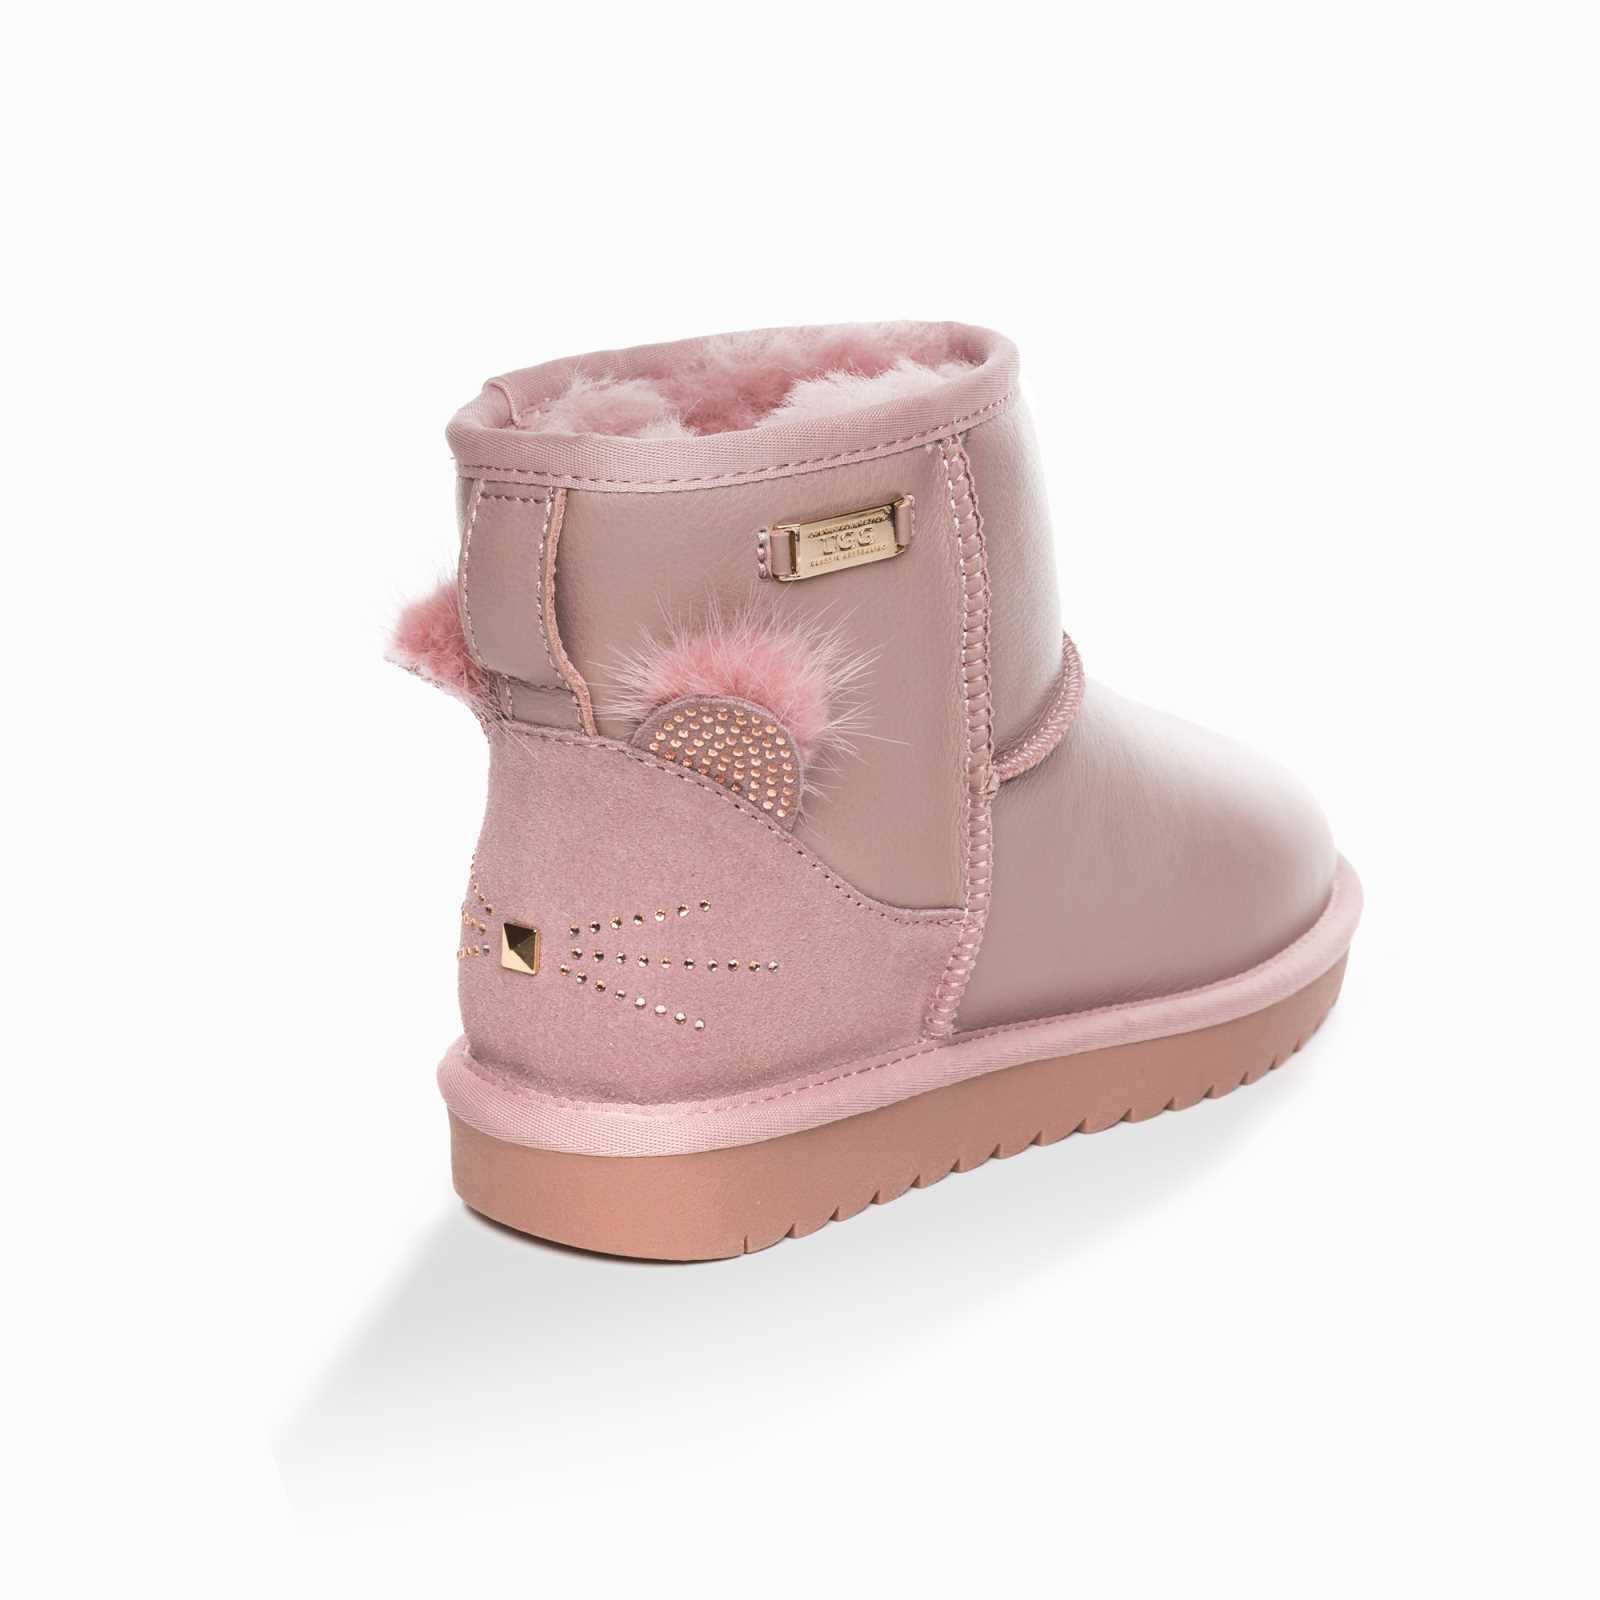 Milly UGG Slippers – Original UGG Boots Australia